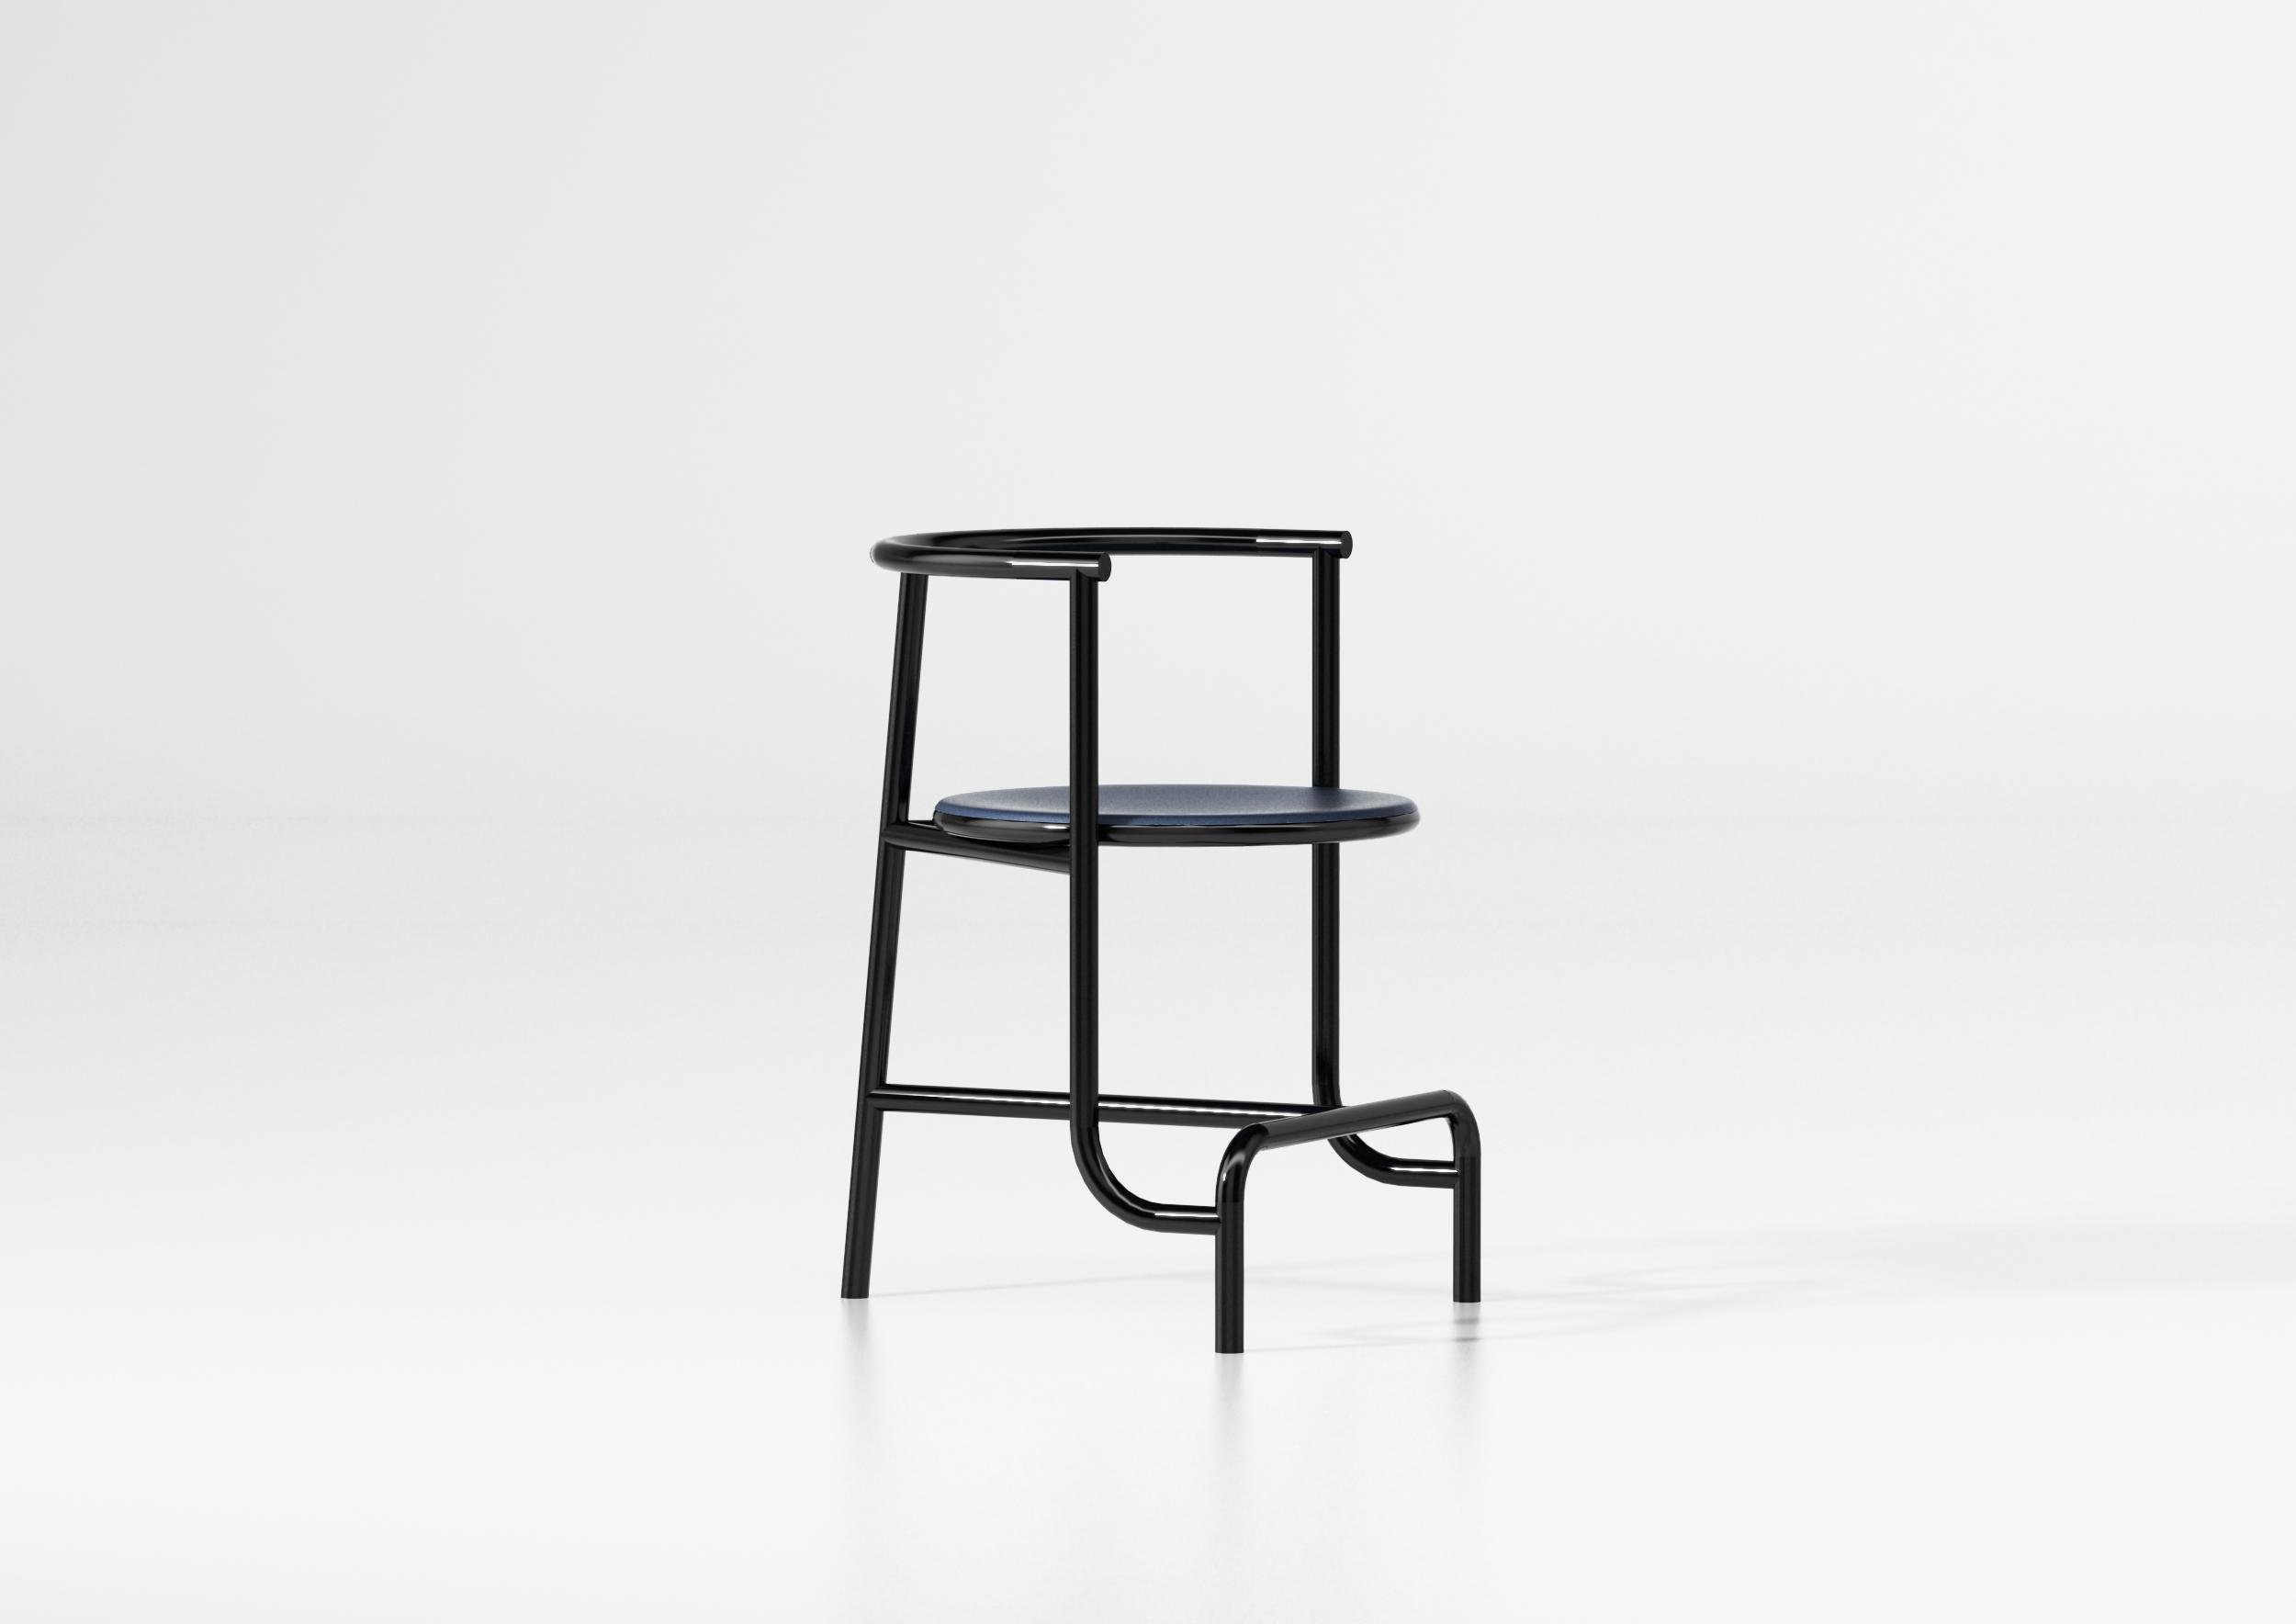 On the occasion of Maison&Objet and Paris Déco Off 2019, designer Fabien Cappello designed a minimal black chair.